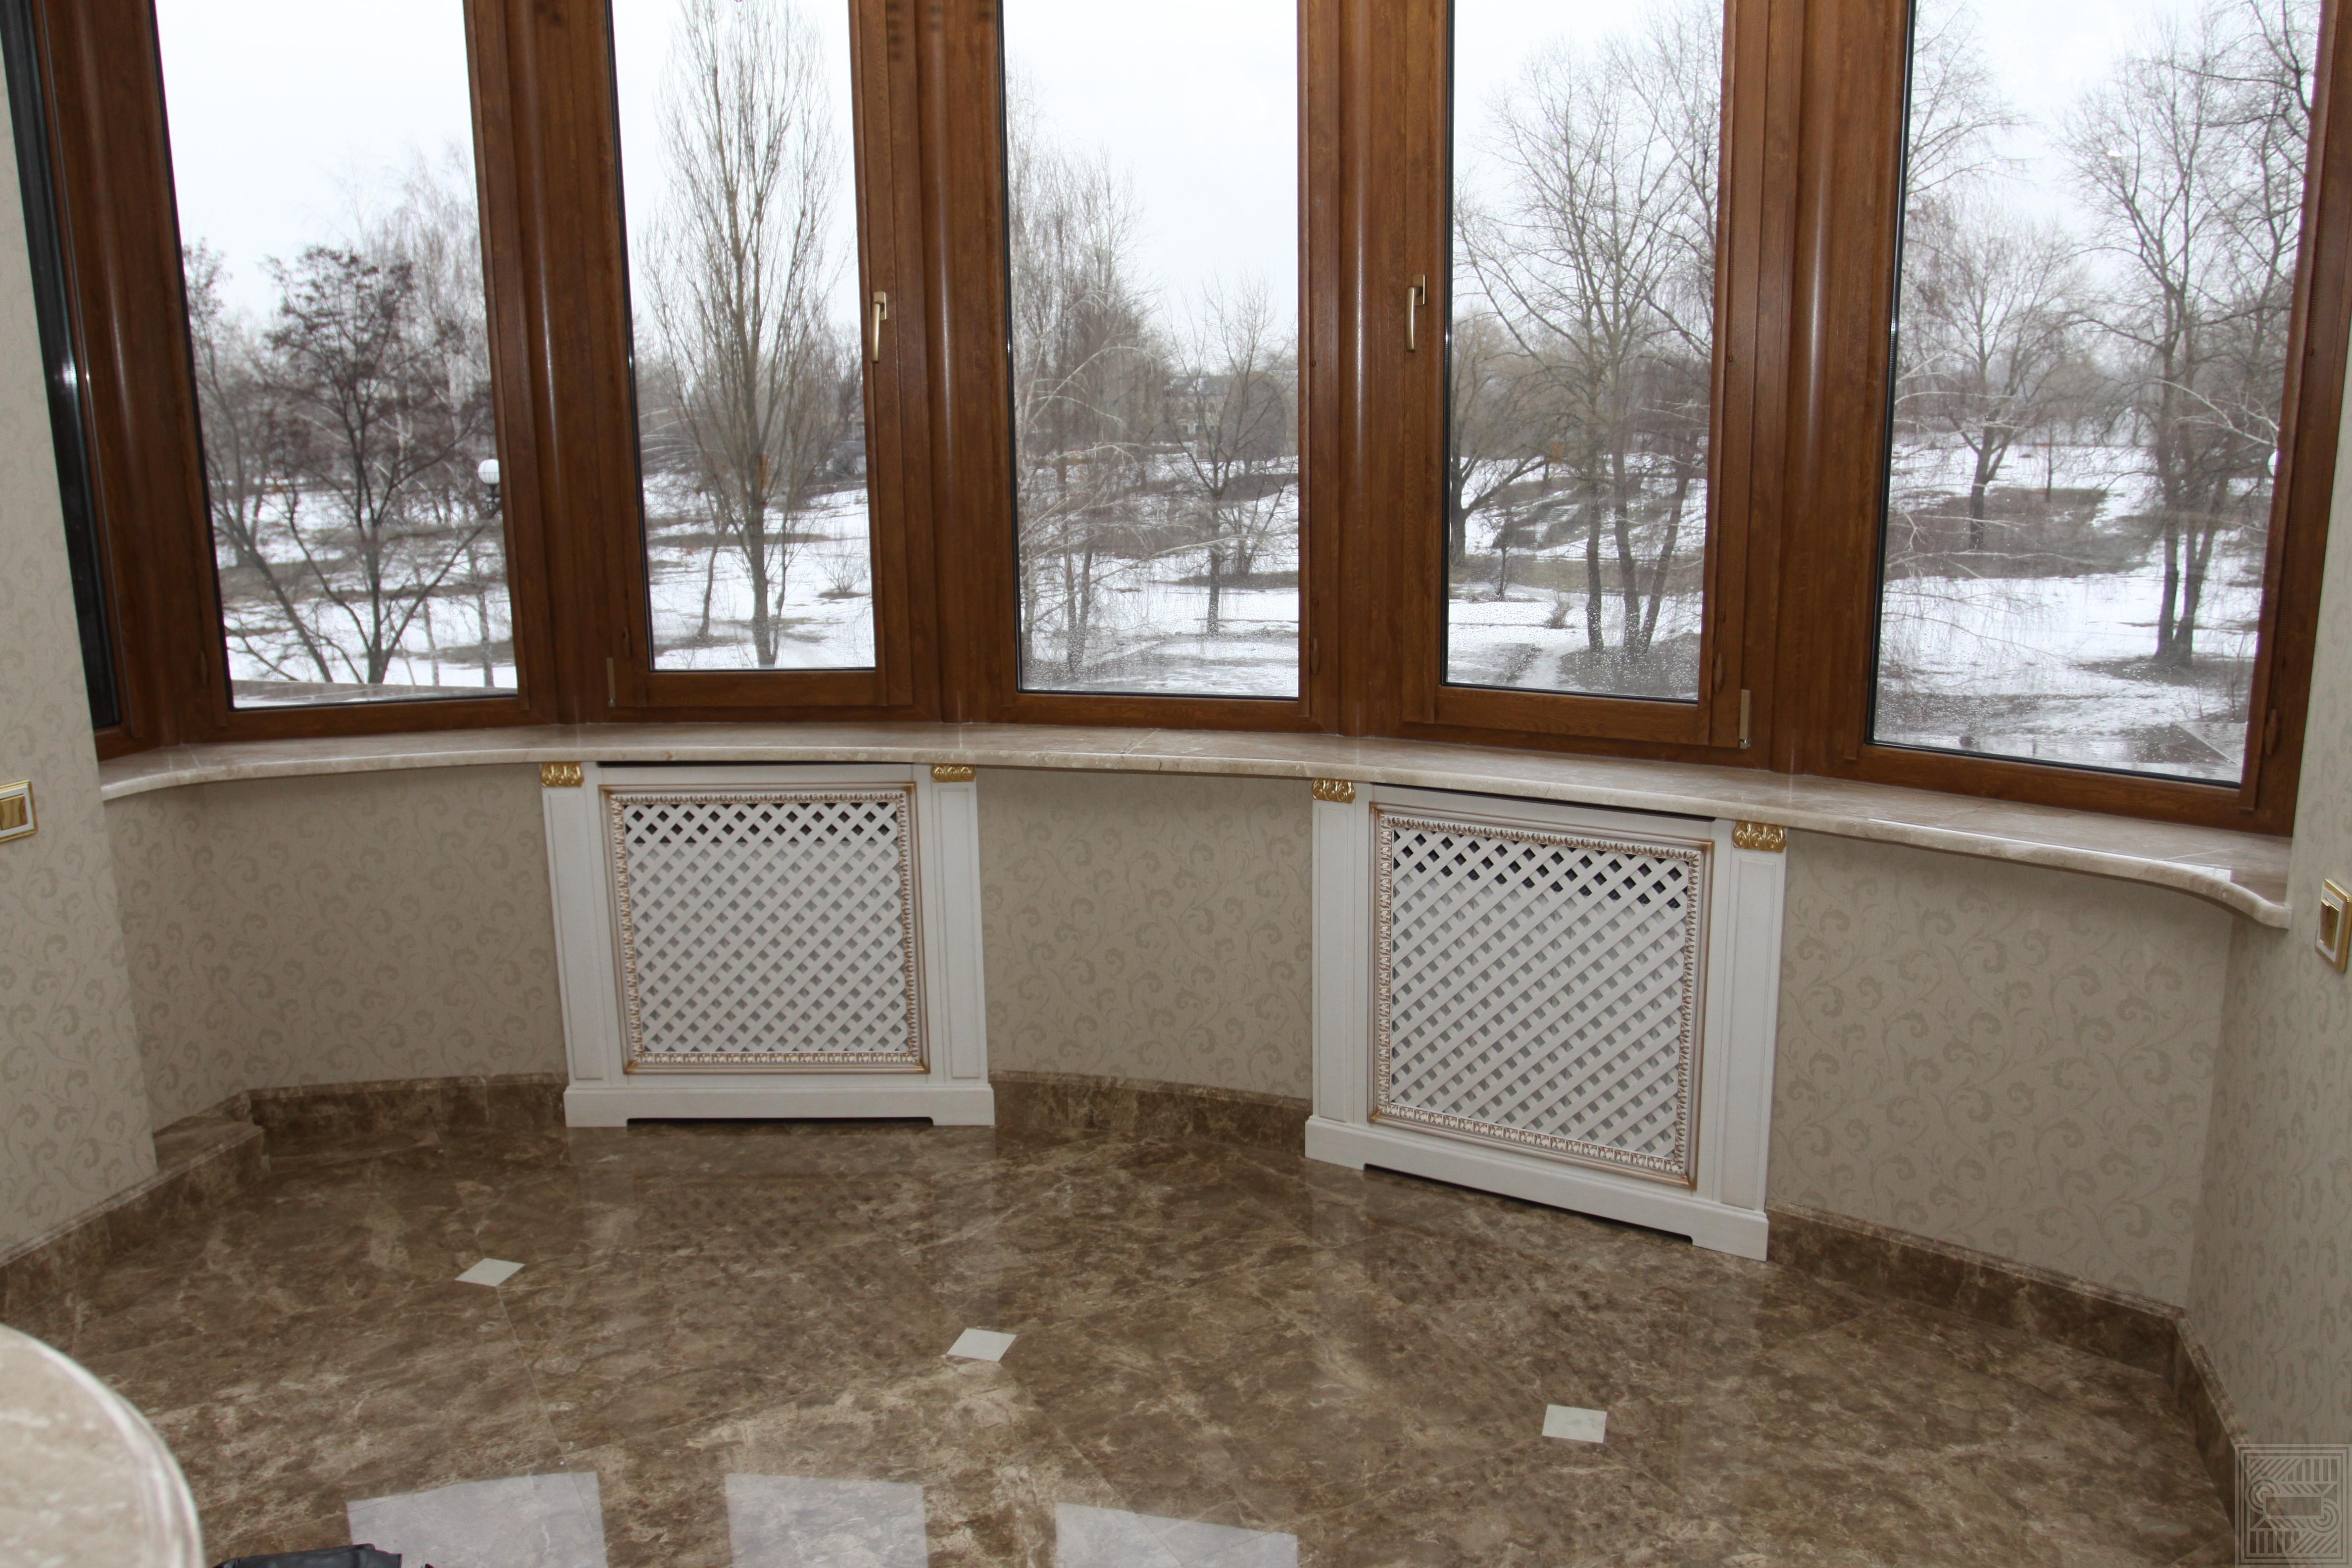 Подоконники  из мрамора Daino 30 мм windowsill-marble - Podokonnik iz mramoa Daino 30 mm